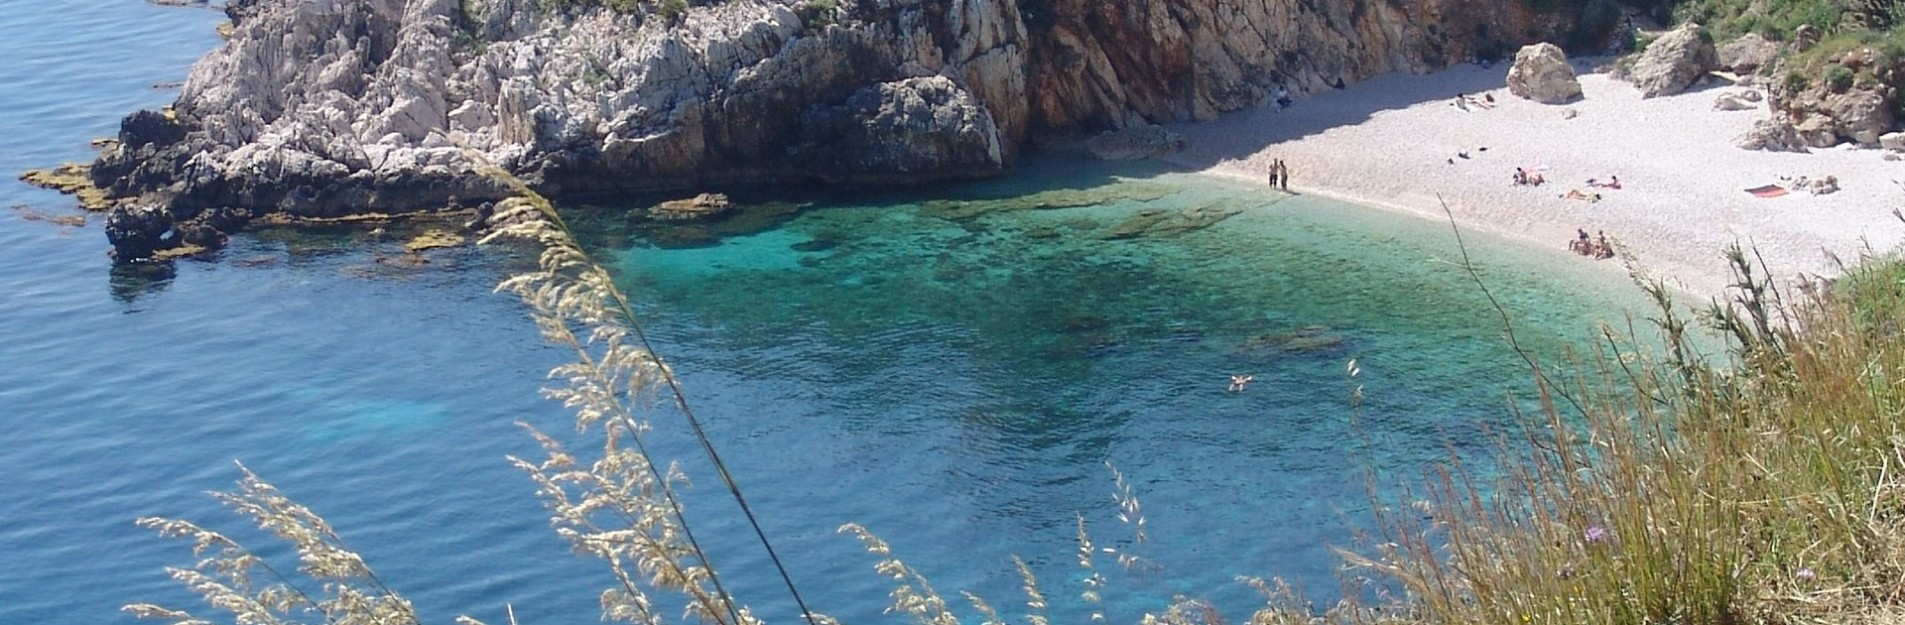 Riserva dello Zingaro ...trekking vista mare!